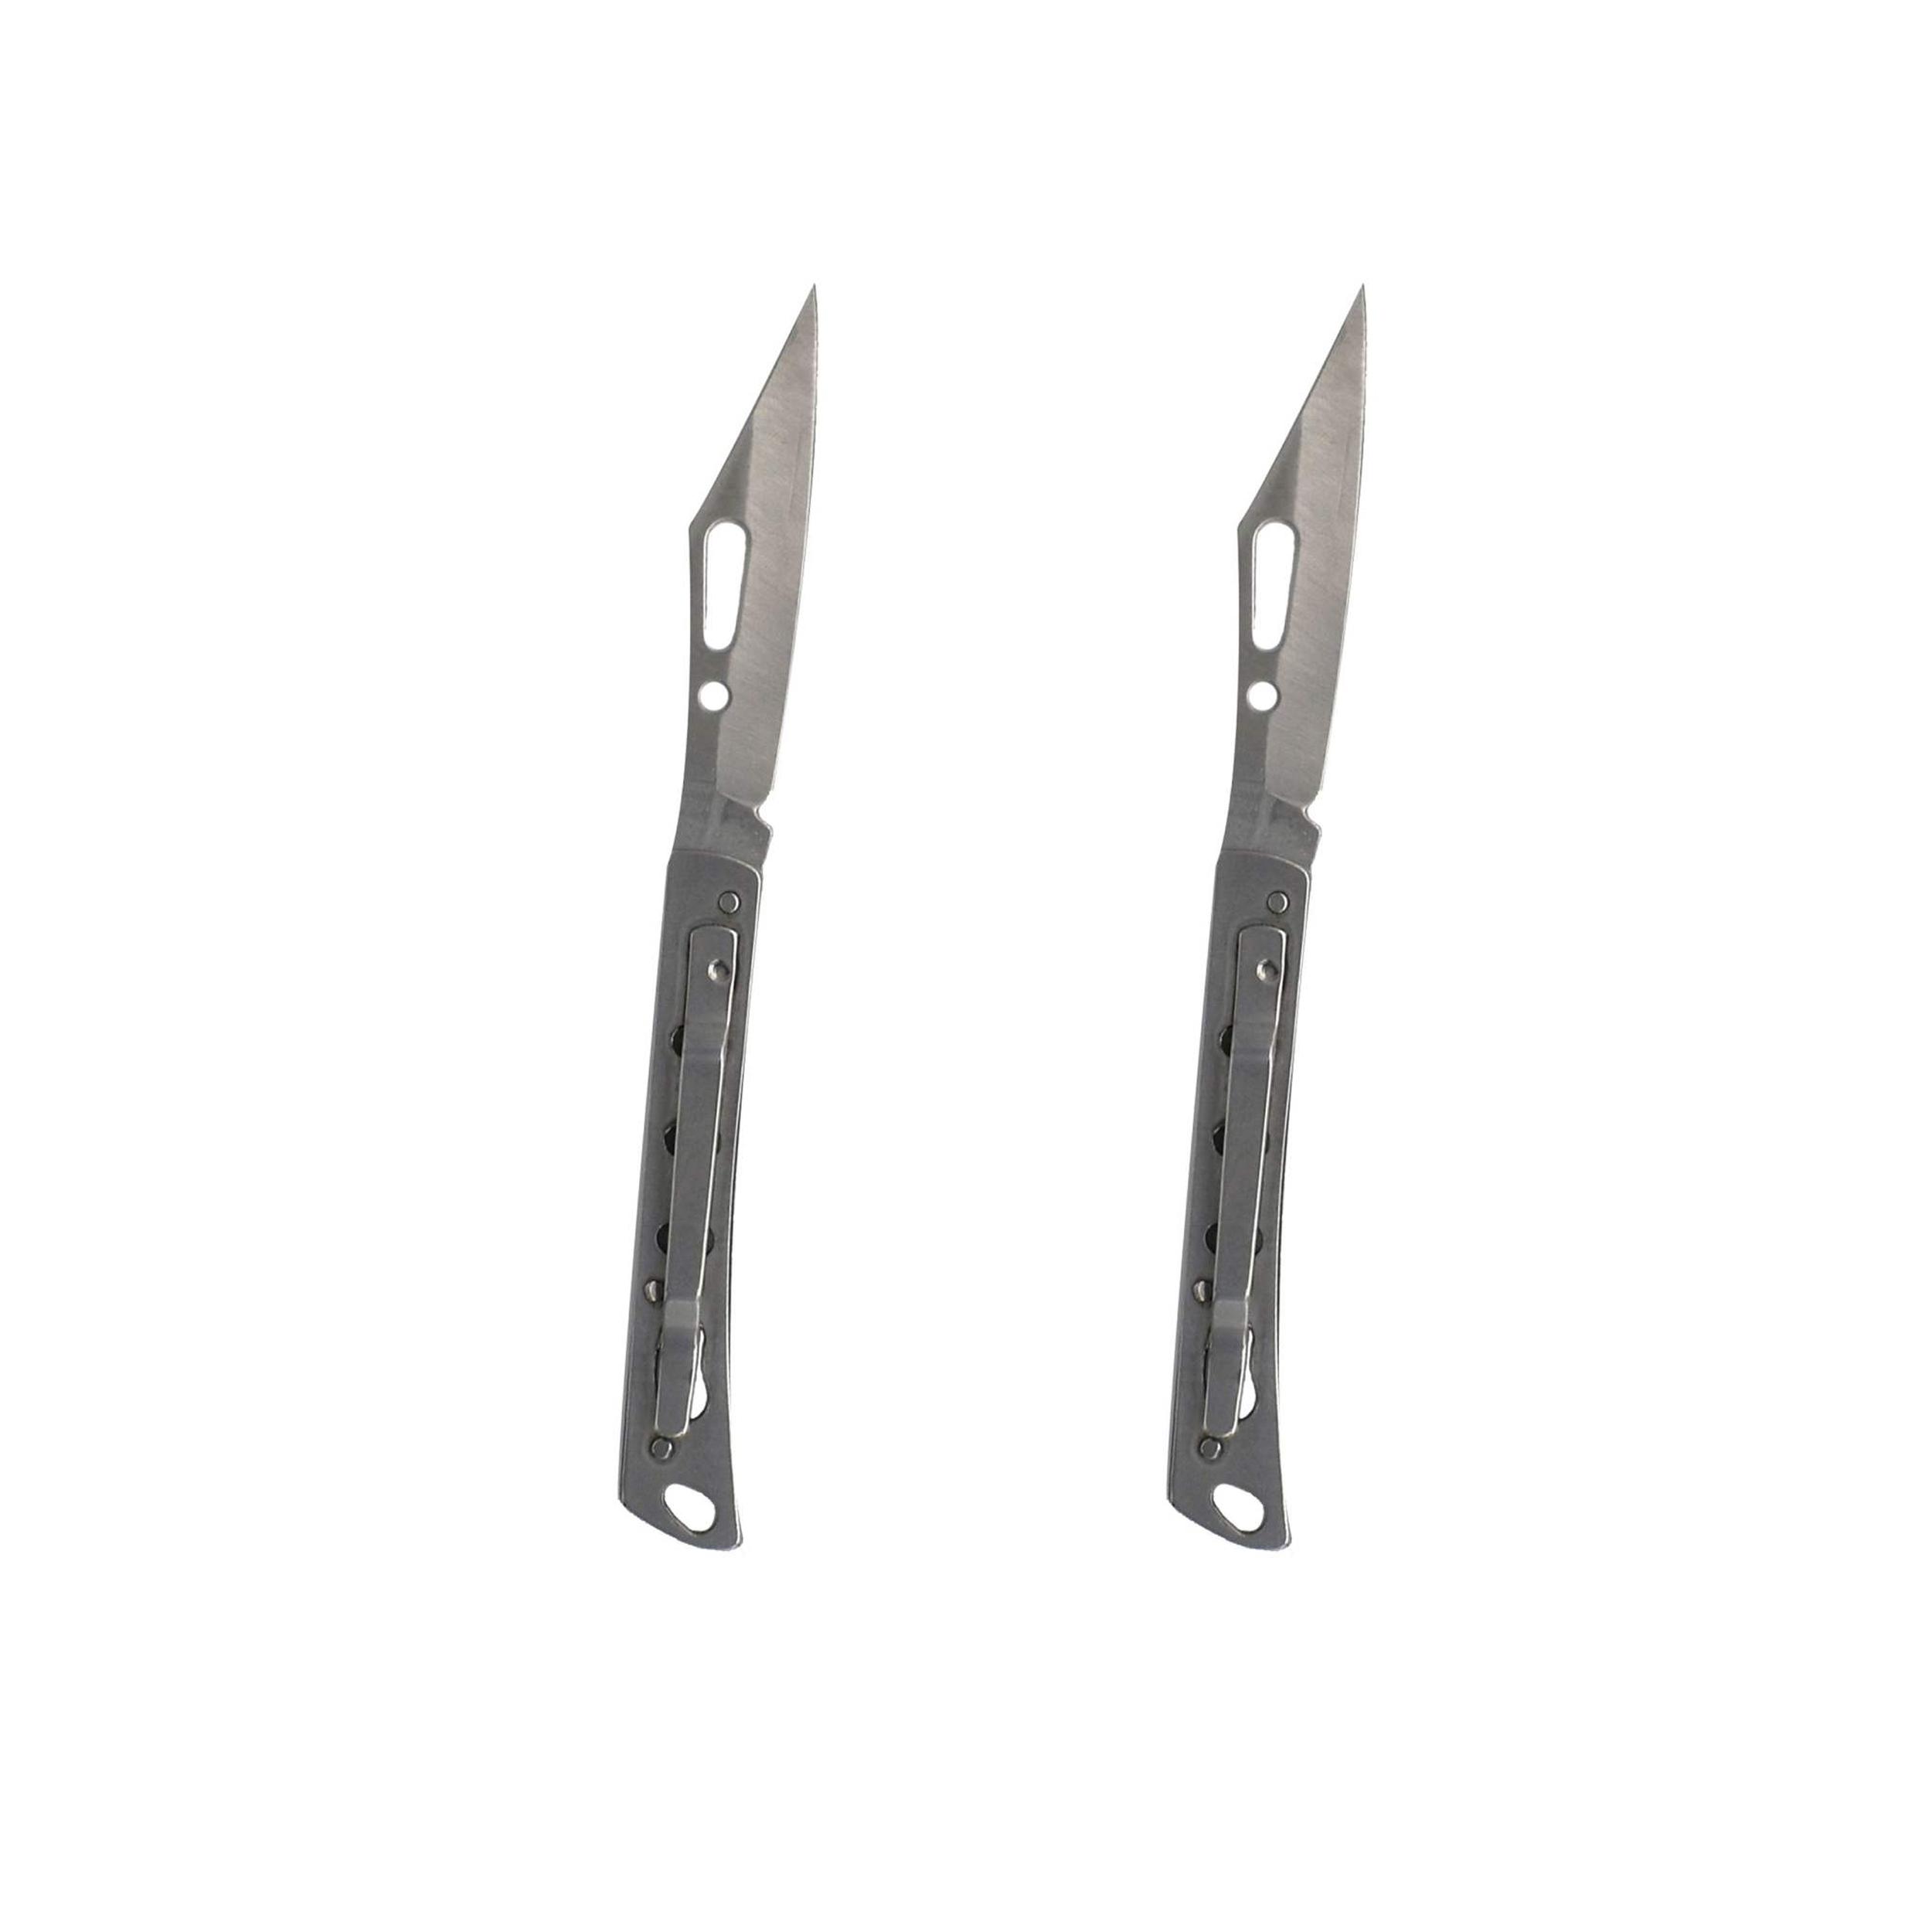 چاقو سفری کد MS-613 مجموعه 2 عددی